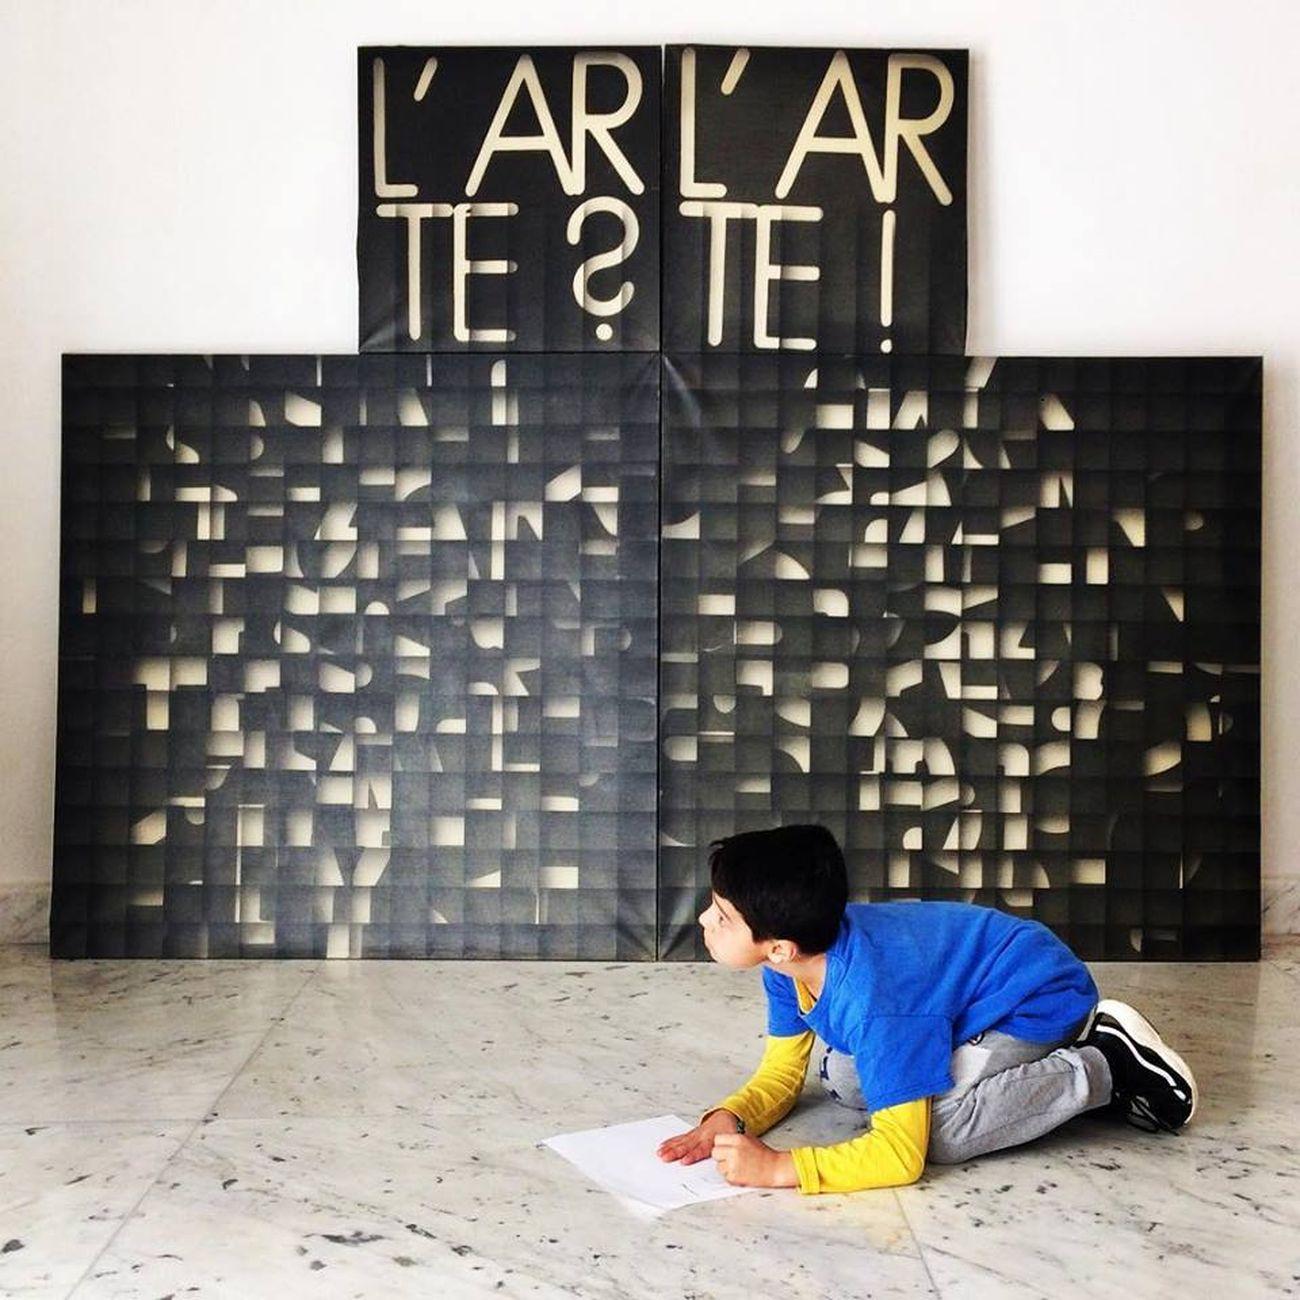 Galleria Comunale d'Arte, Cagliari. Photo Marco Peri